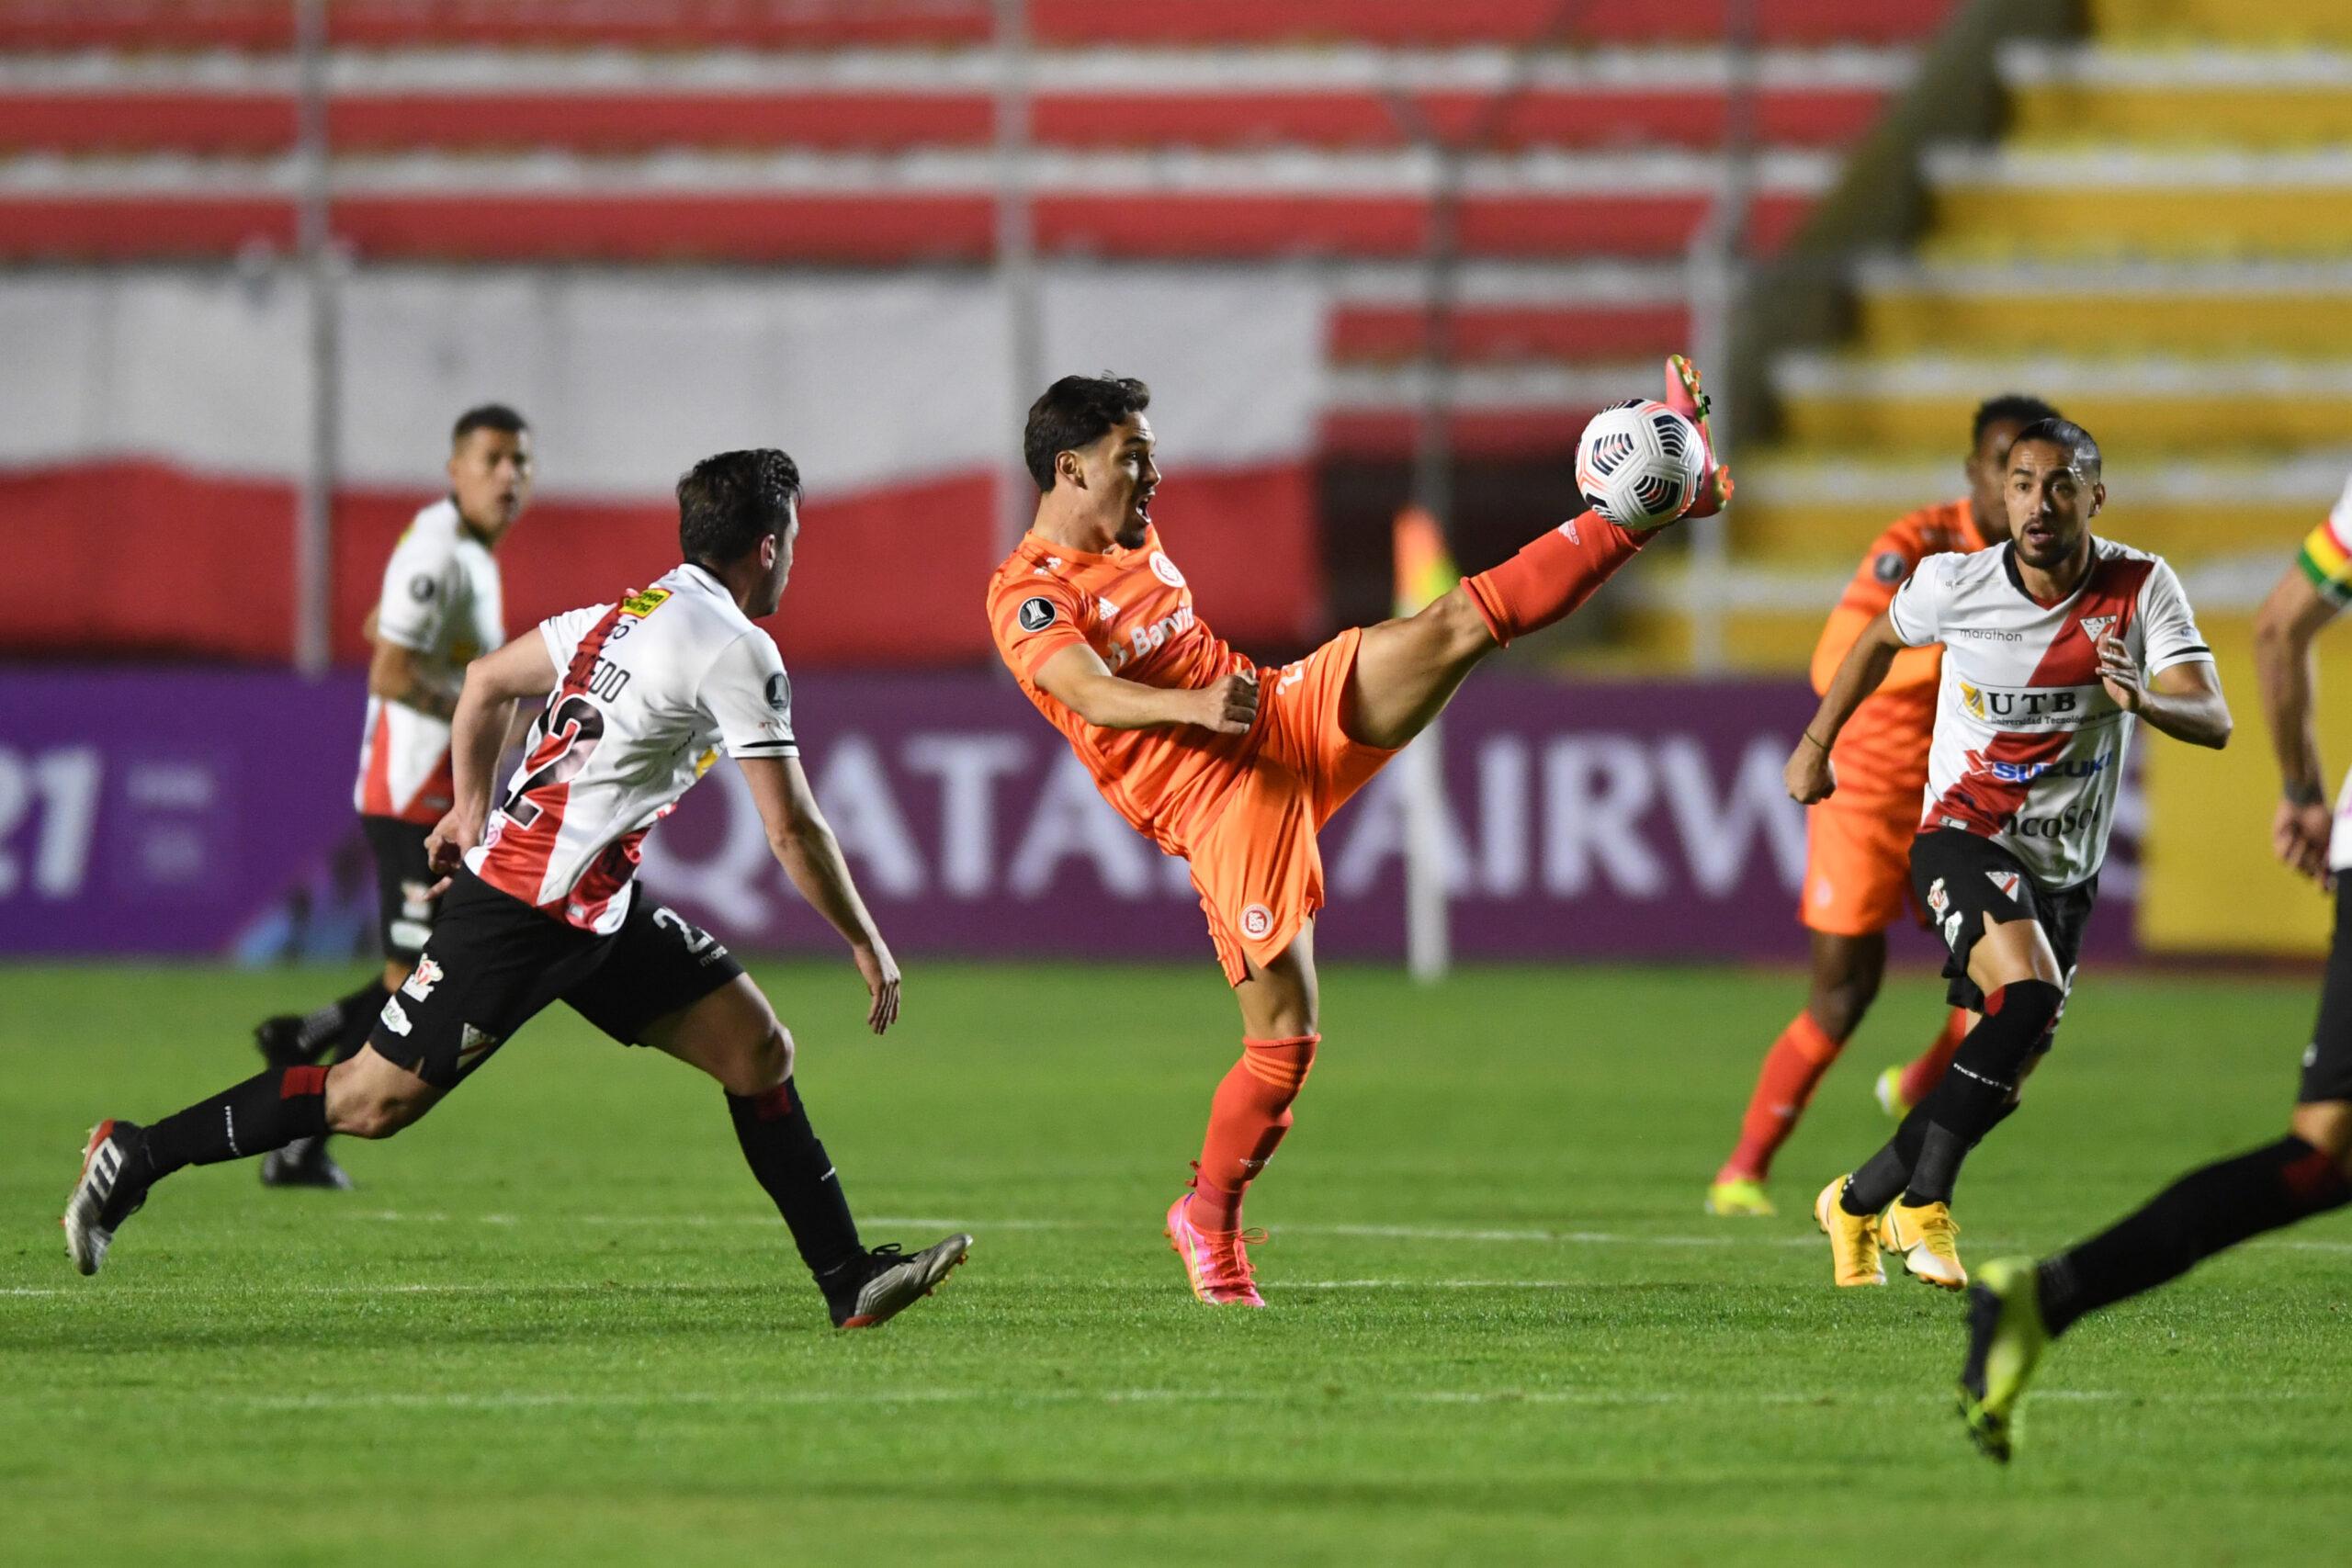 Inter estreia de forma desastrosa na Libertadores